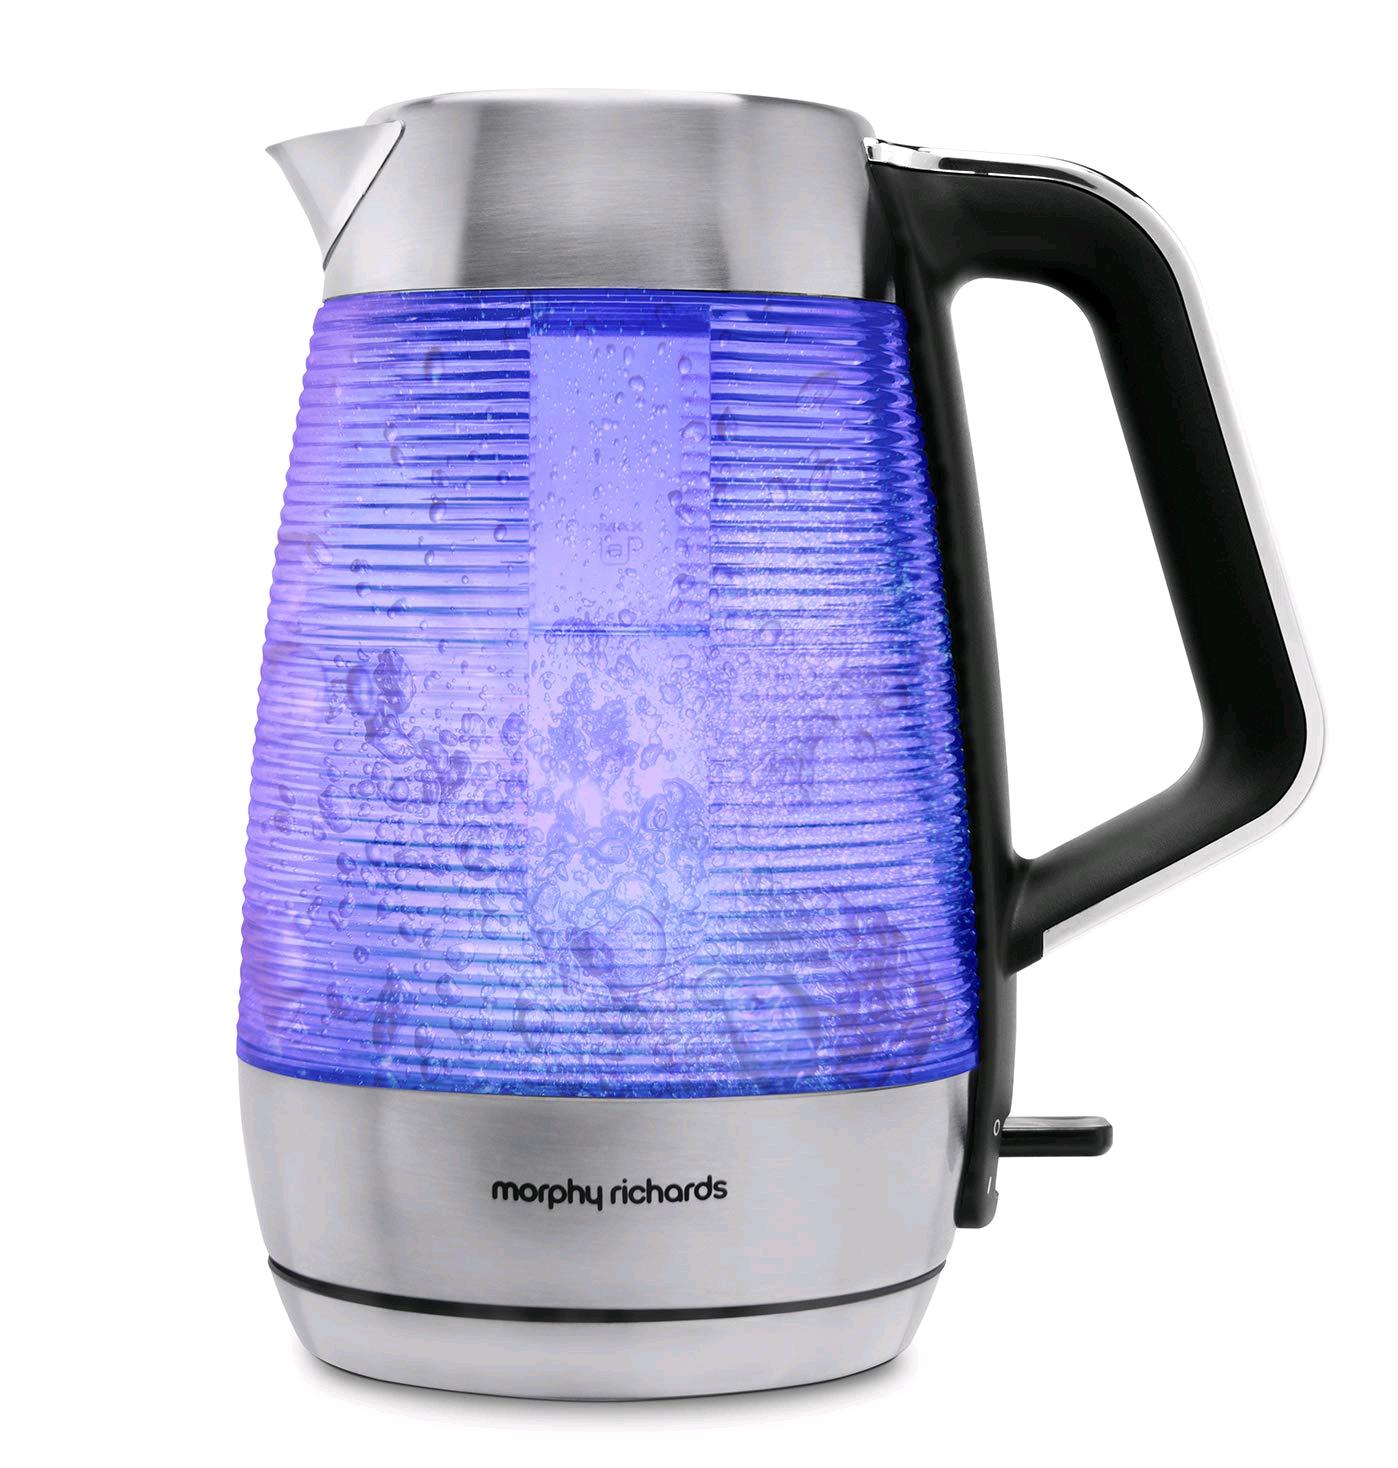 Morphy Richards Vetro Glass Kettle 1.5L Blue Illumination